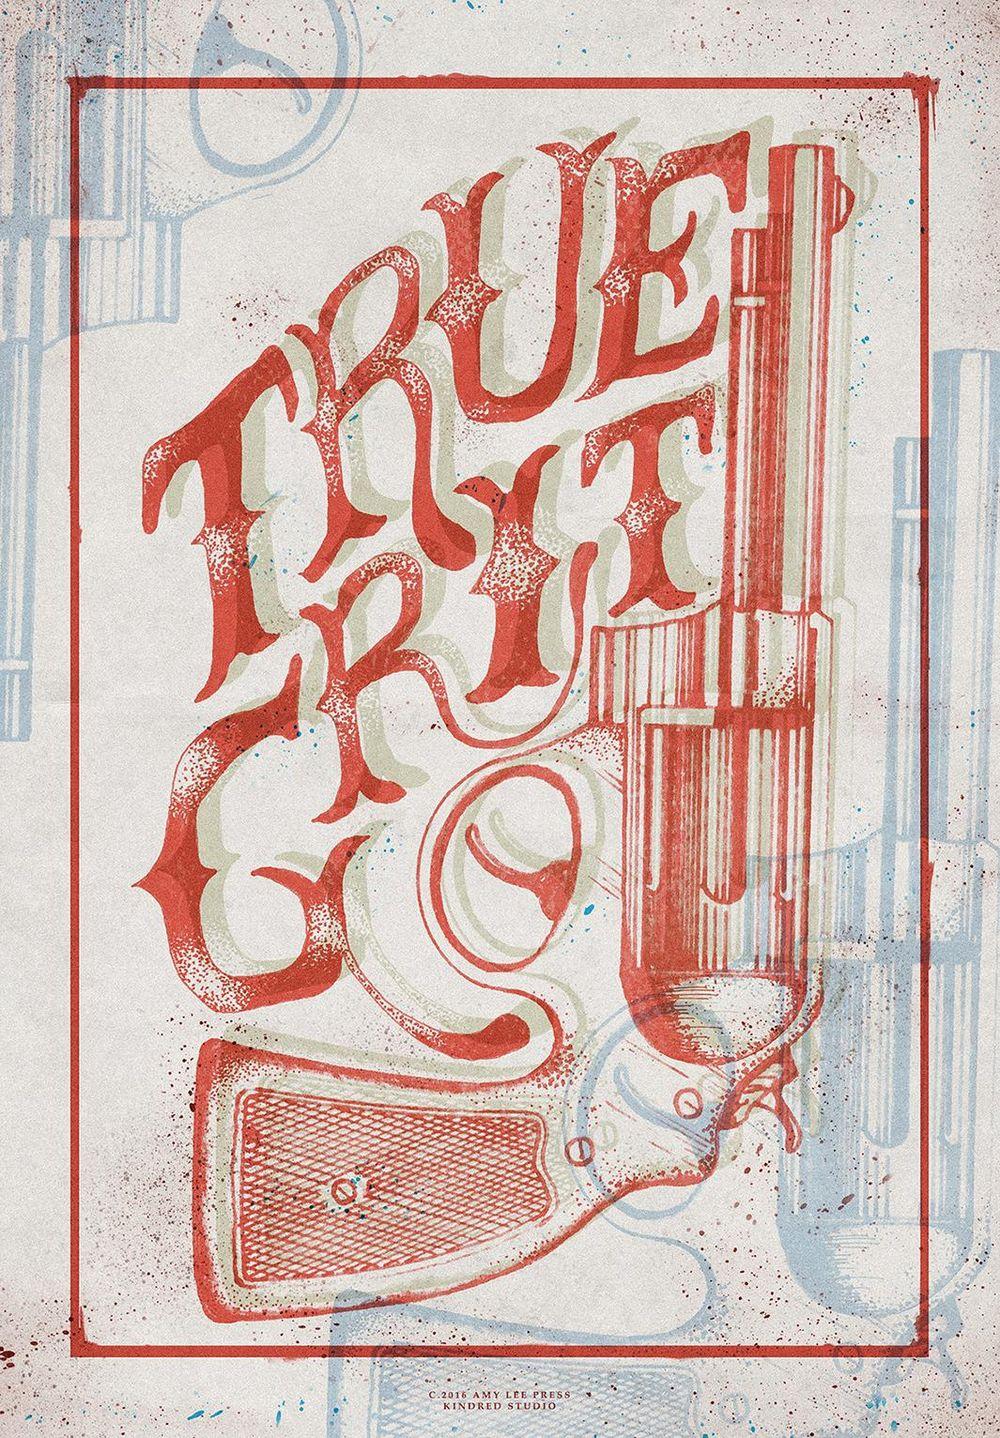 T R U E   G R I T - image 4 - student project